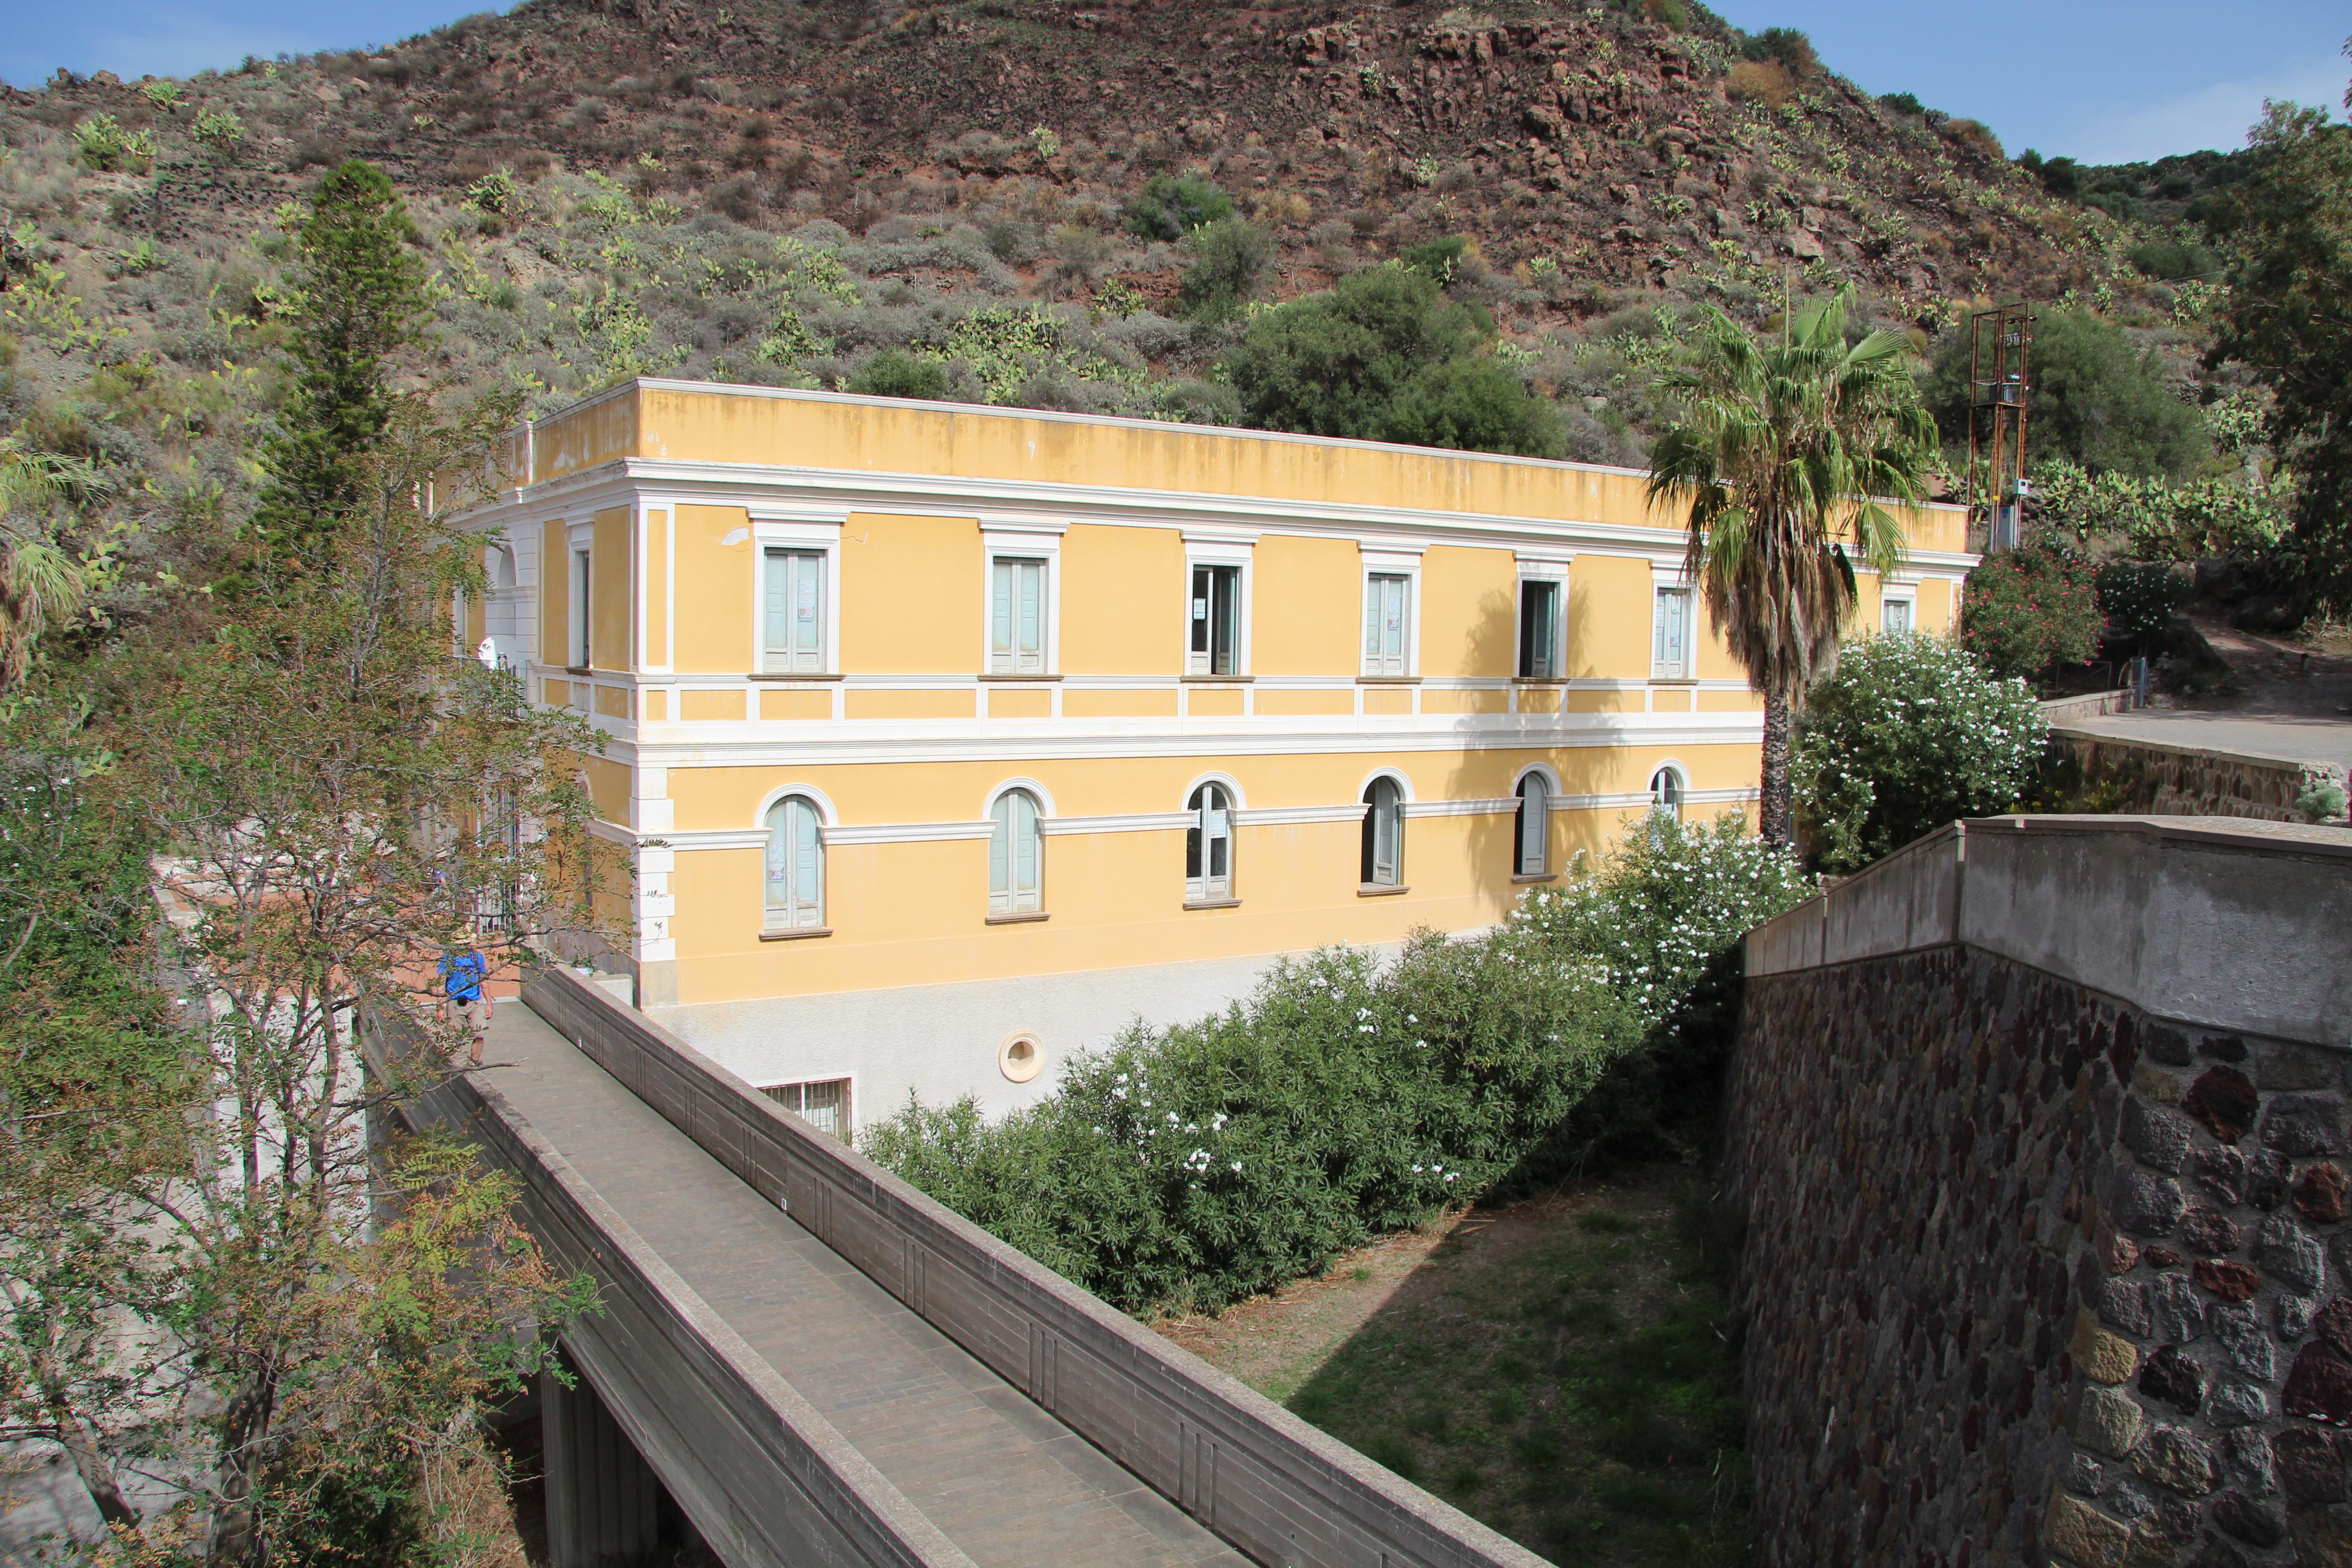 File:Bagni Termali San Calogero.JPG - Wikimedia Commons